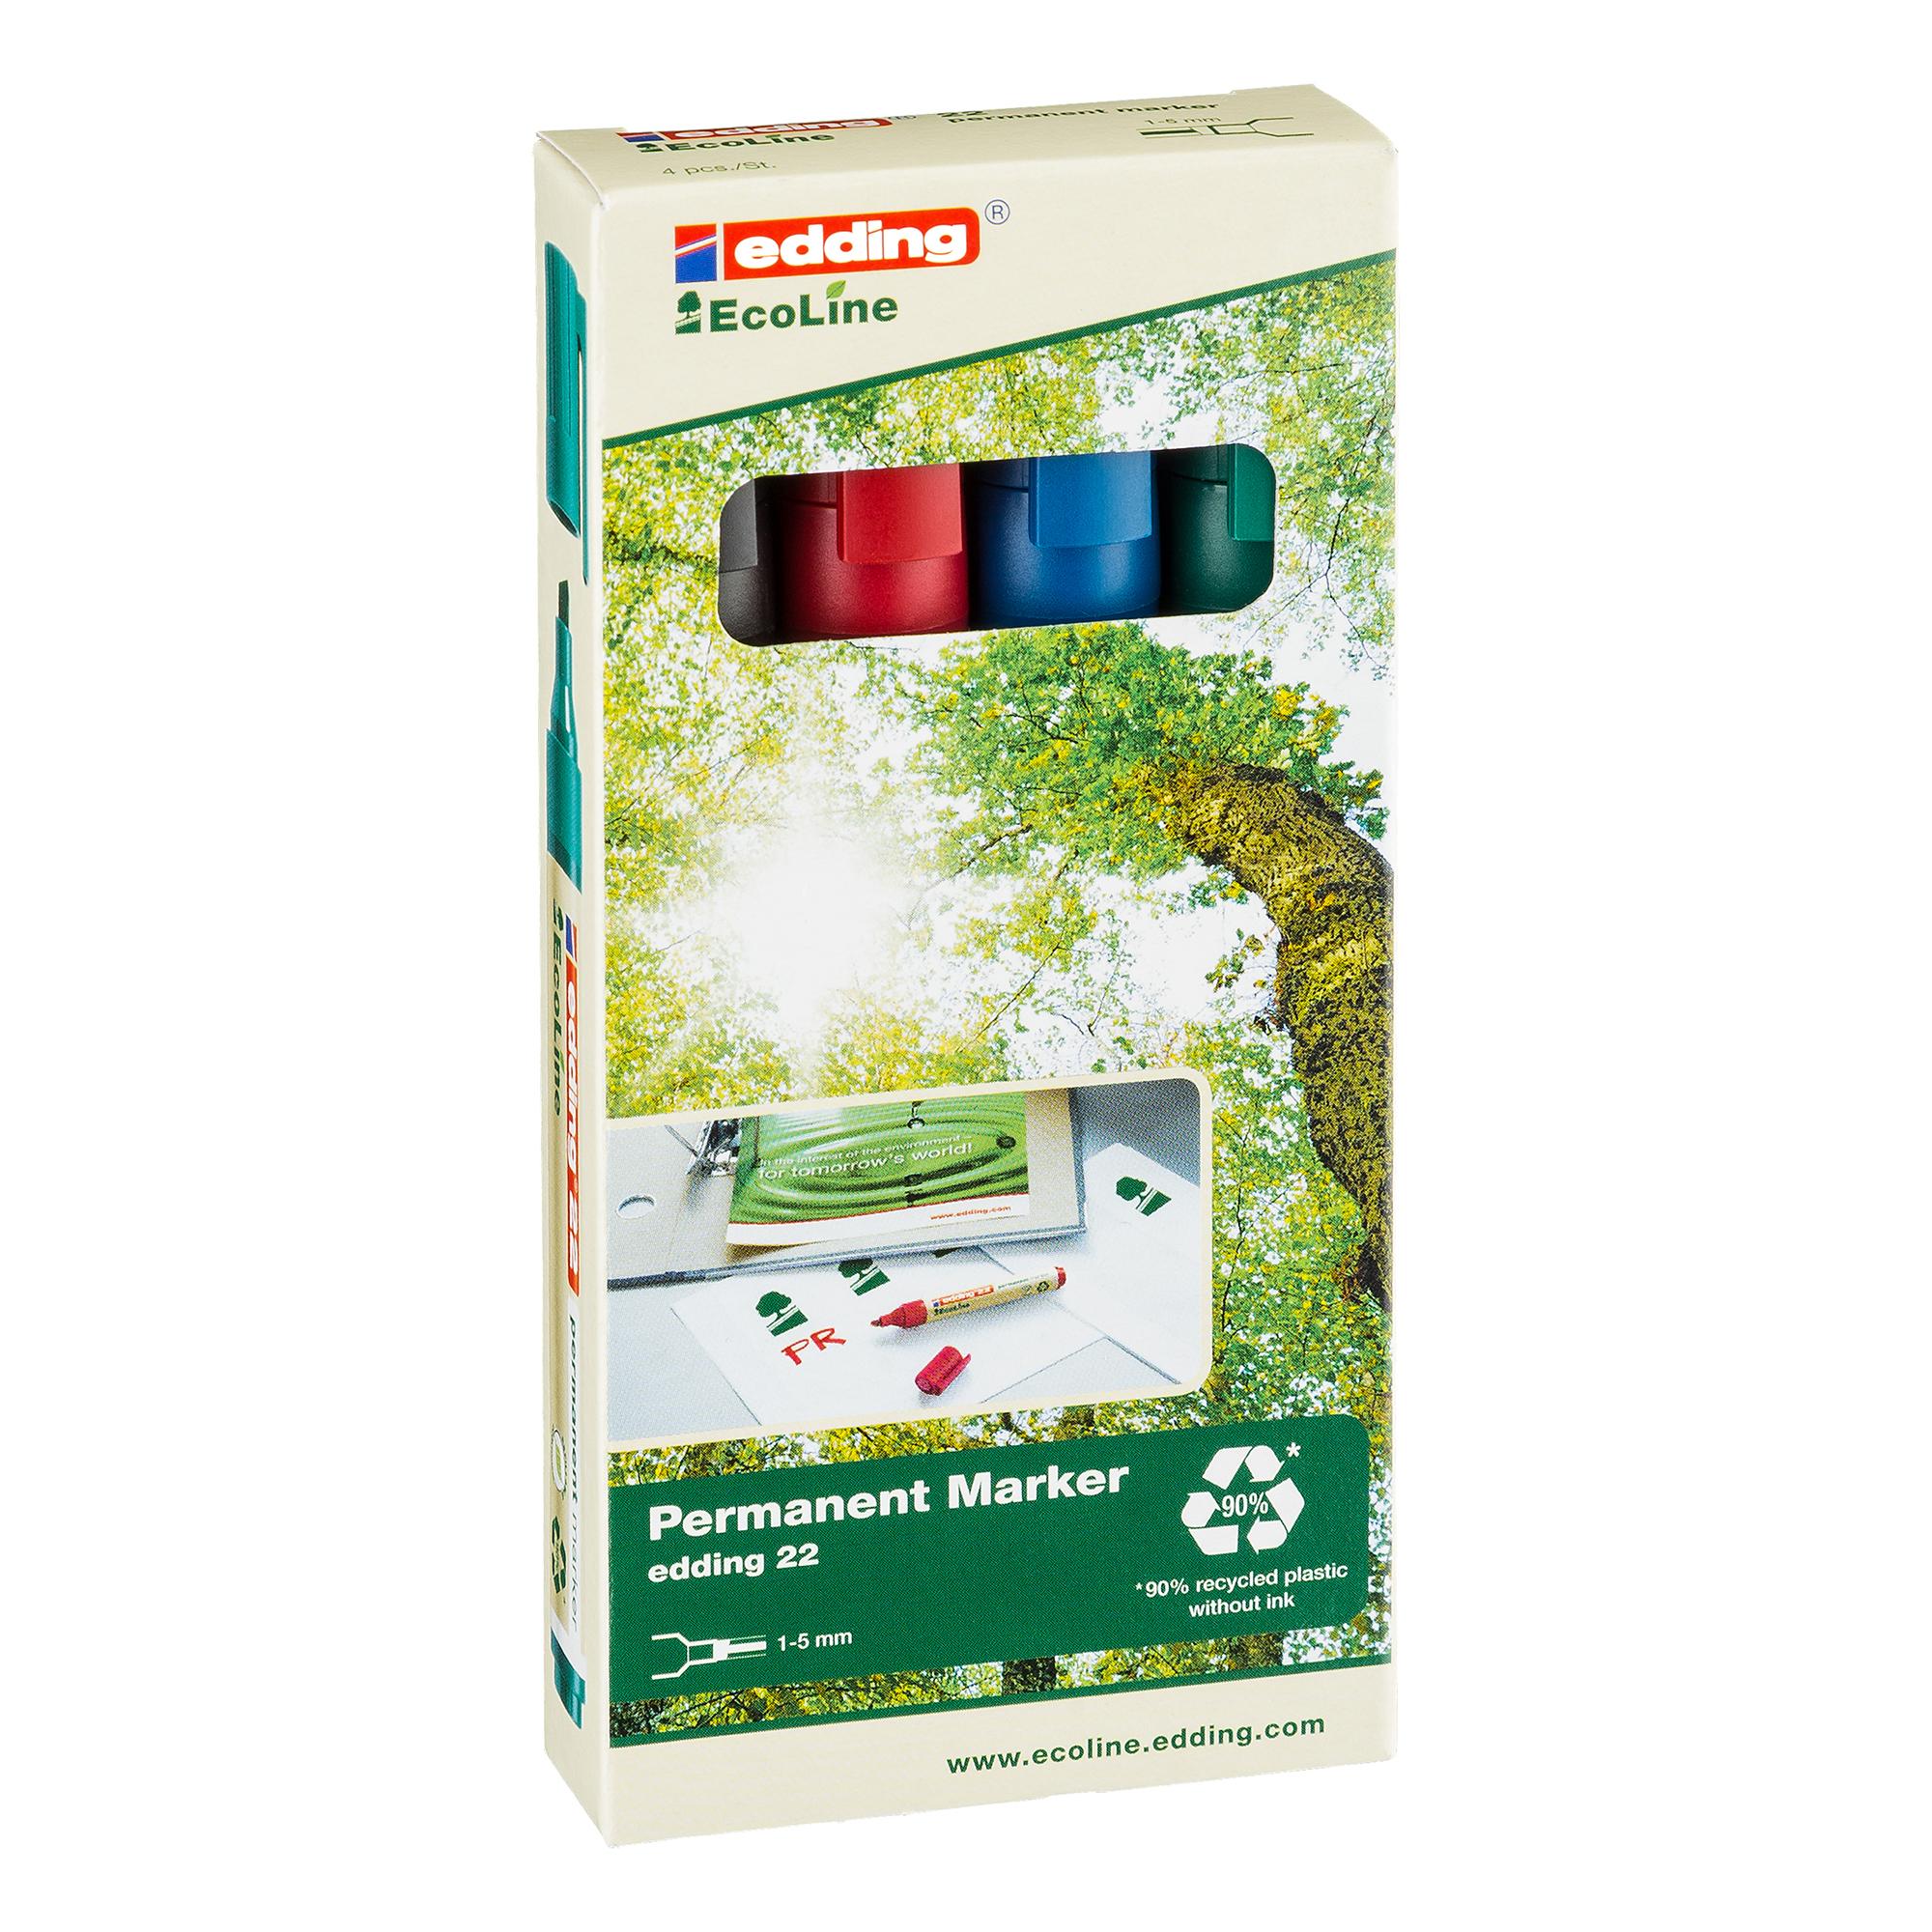 Permanent Markers Edding e-22 EcoLine Permanent Marker Chisel Tip Assorted Ref 4-22-4 Pack 4